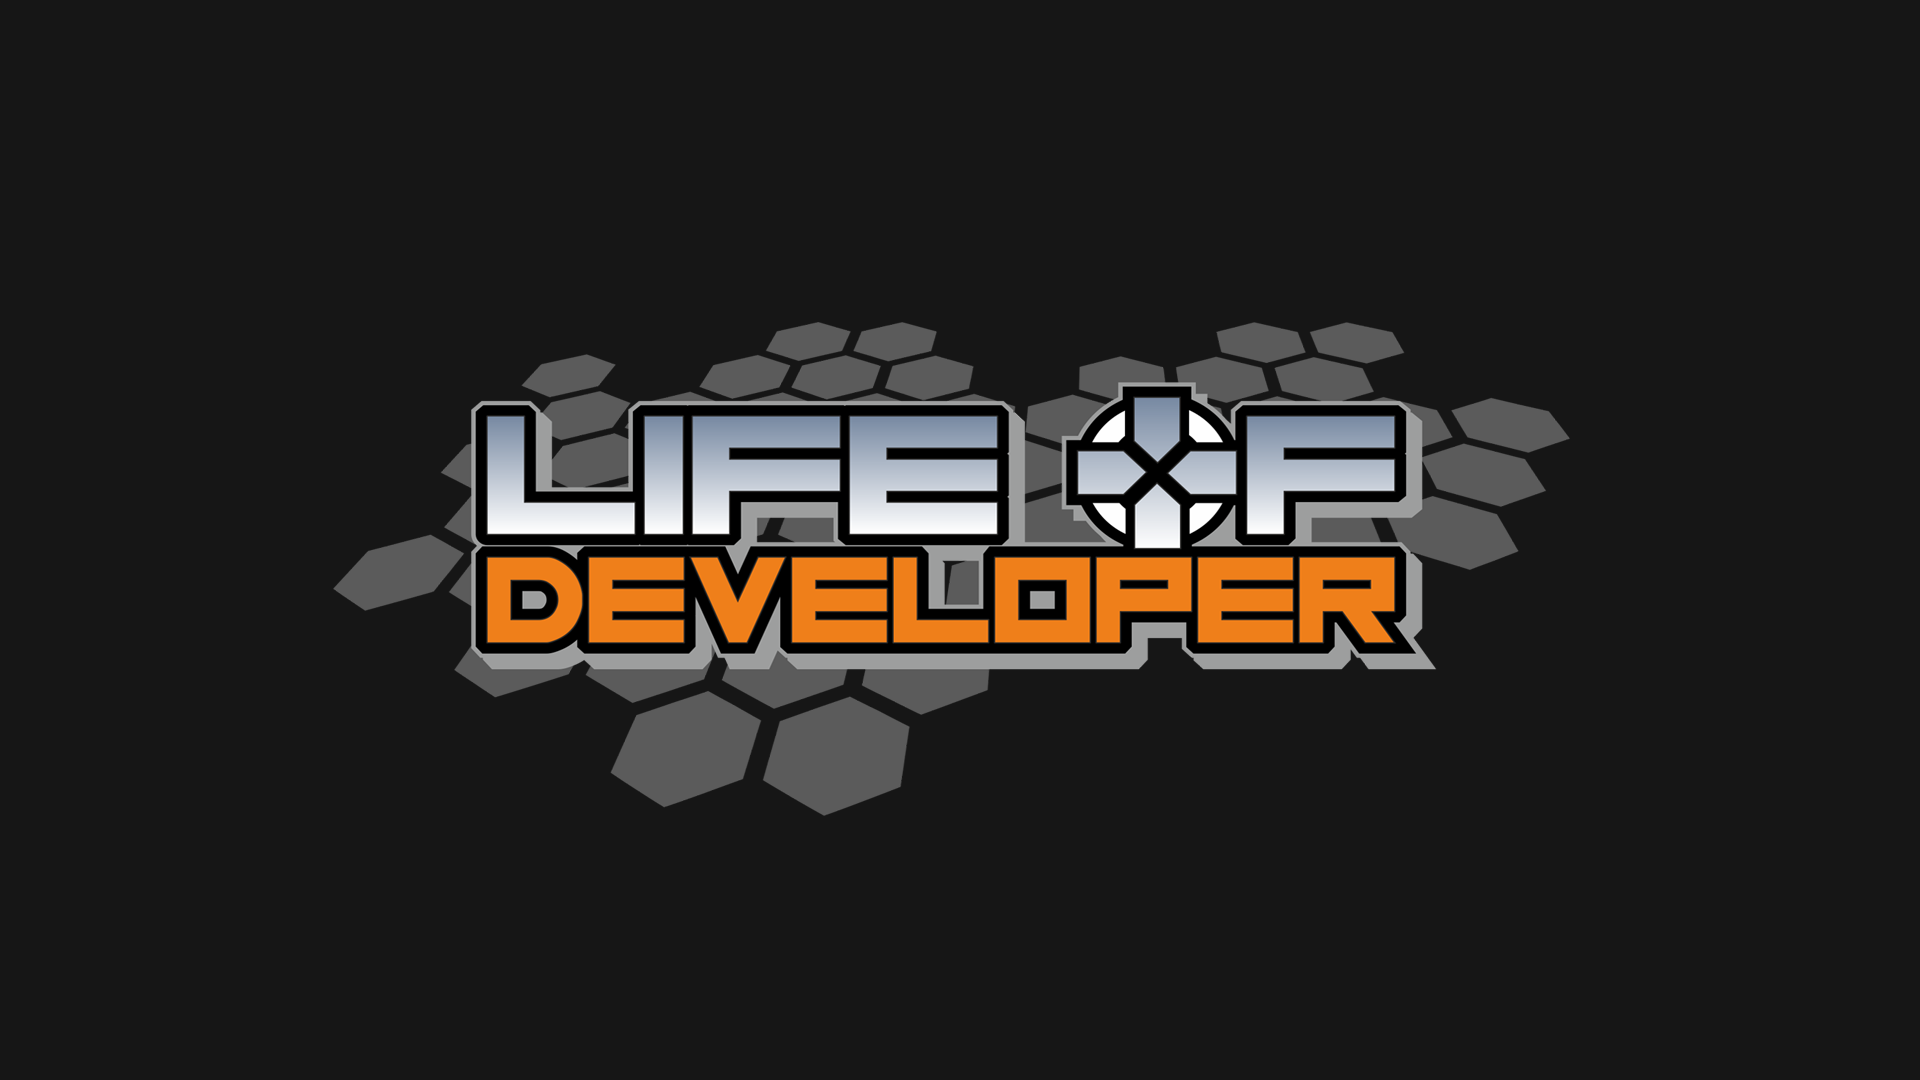 Feed Report media Life Of Developer Wallpaper FULLHD view original 1920x1080